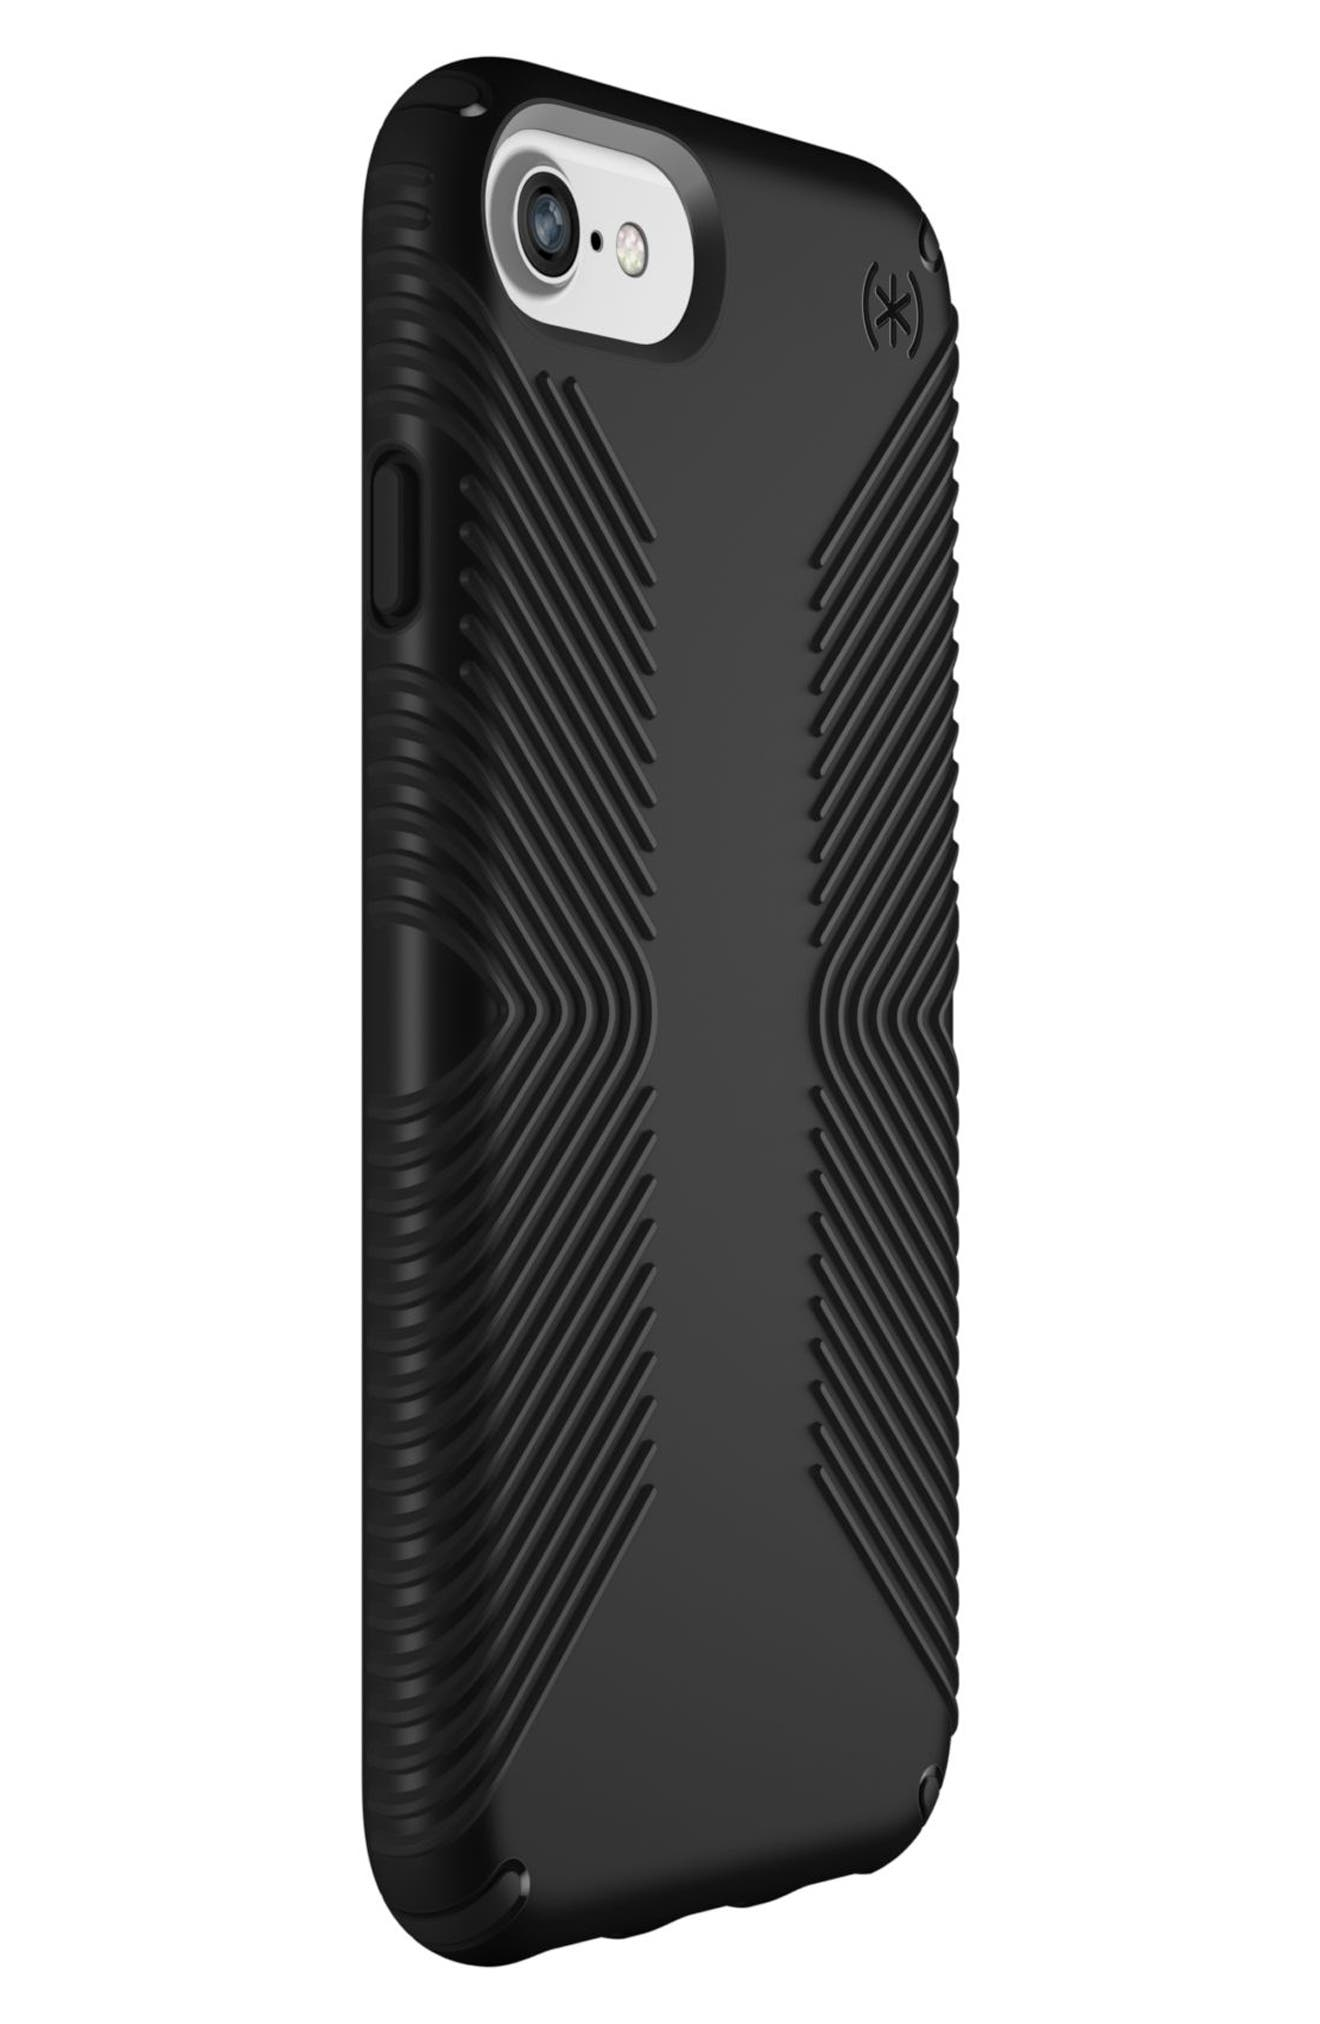 SPECK, Grip iPhone 6/6s/7/8 Case, Alternate thumbnail 8, color, 001